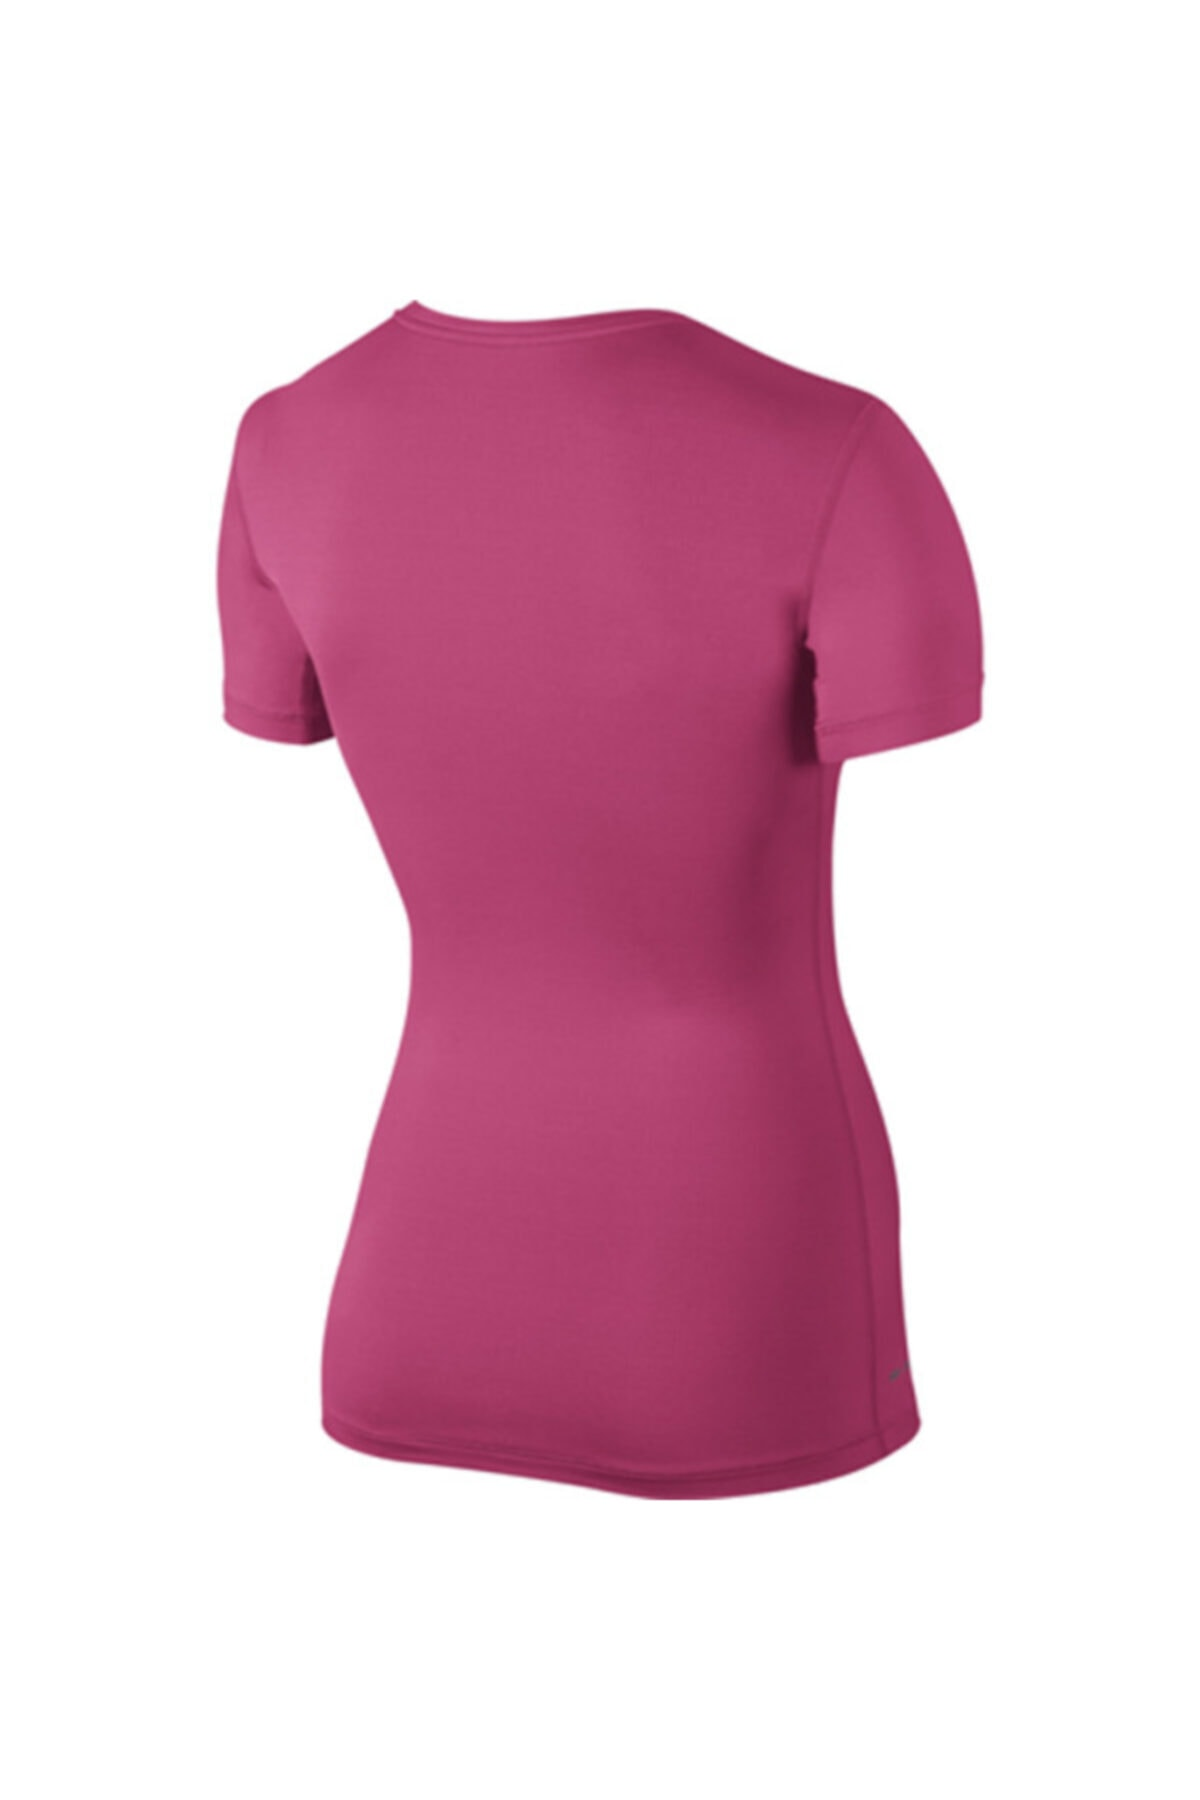 Nike Nıke Pro Womens Top Ss Kadın Tişort 725745-616 2